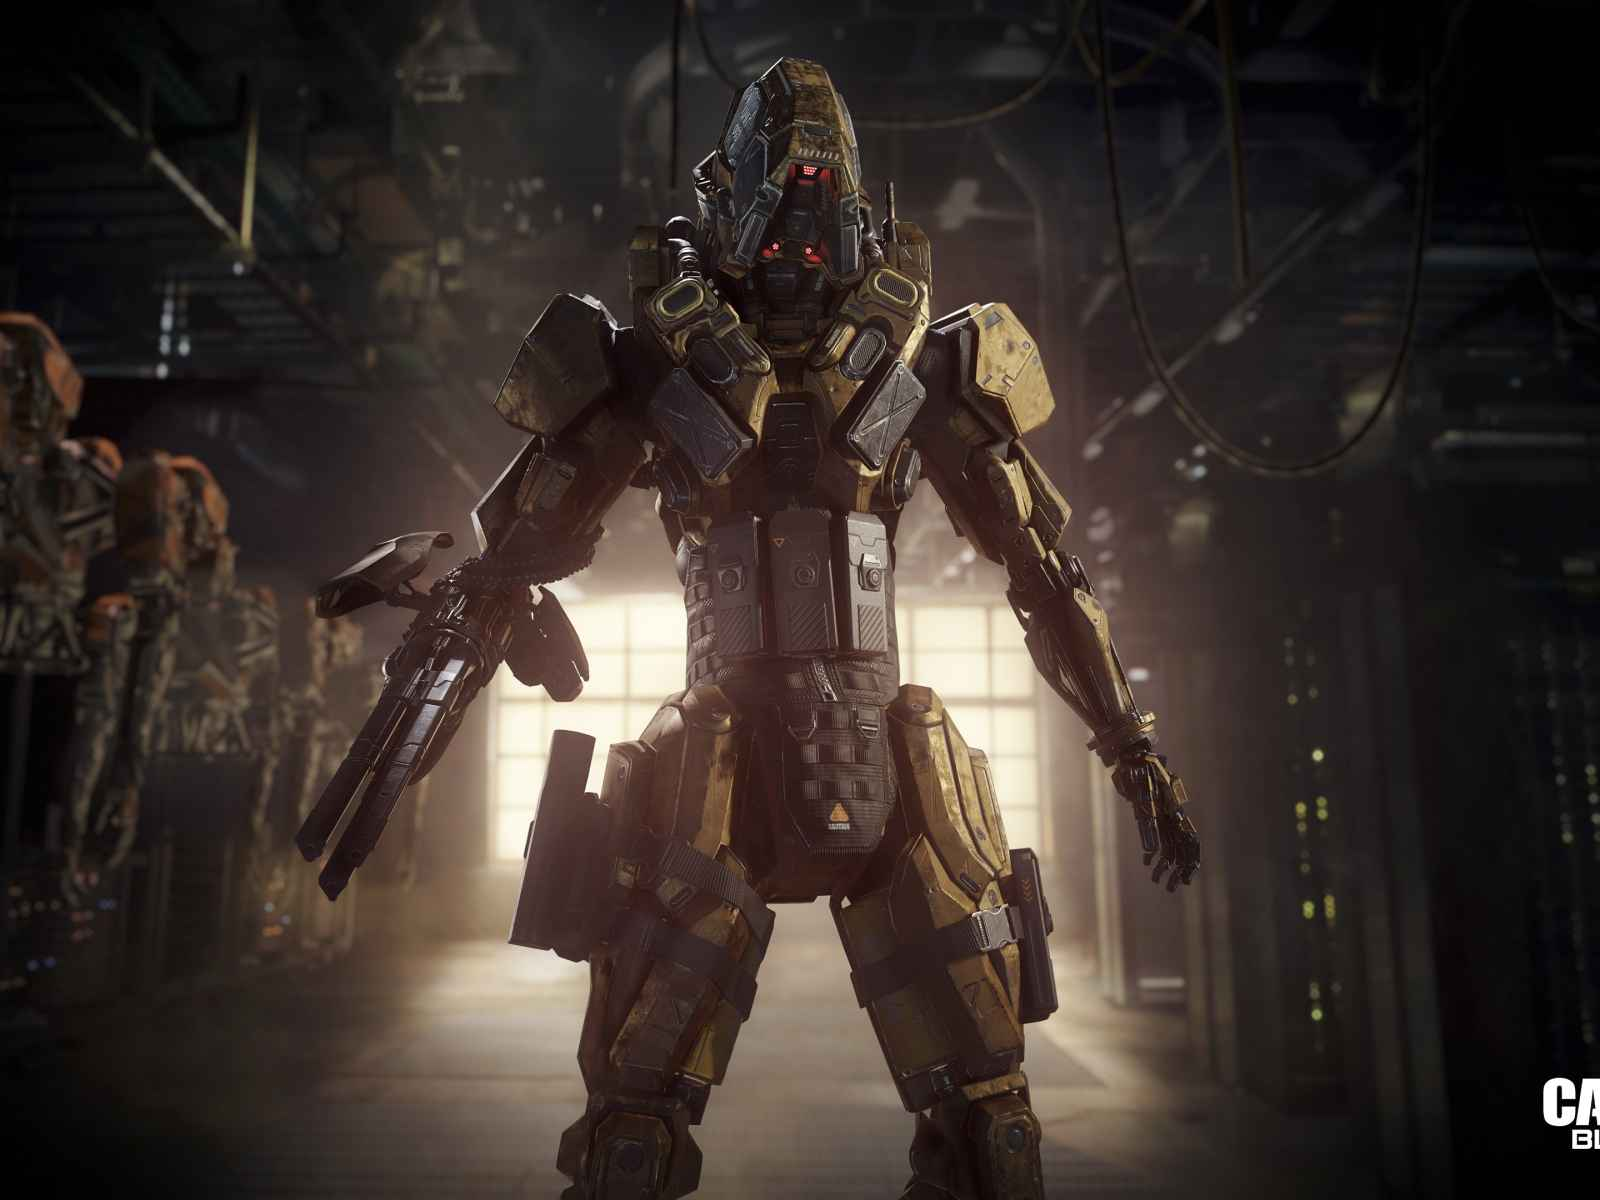 Call of duty, Black ops iii, Robot 1600×1200 HD Background